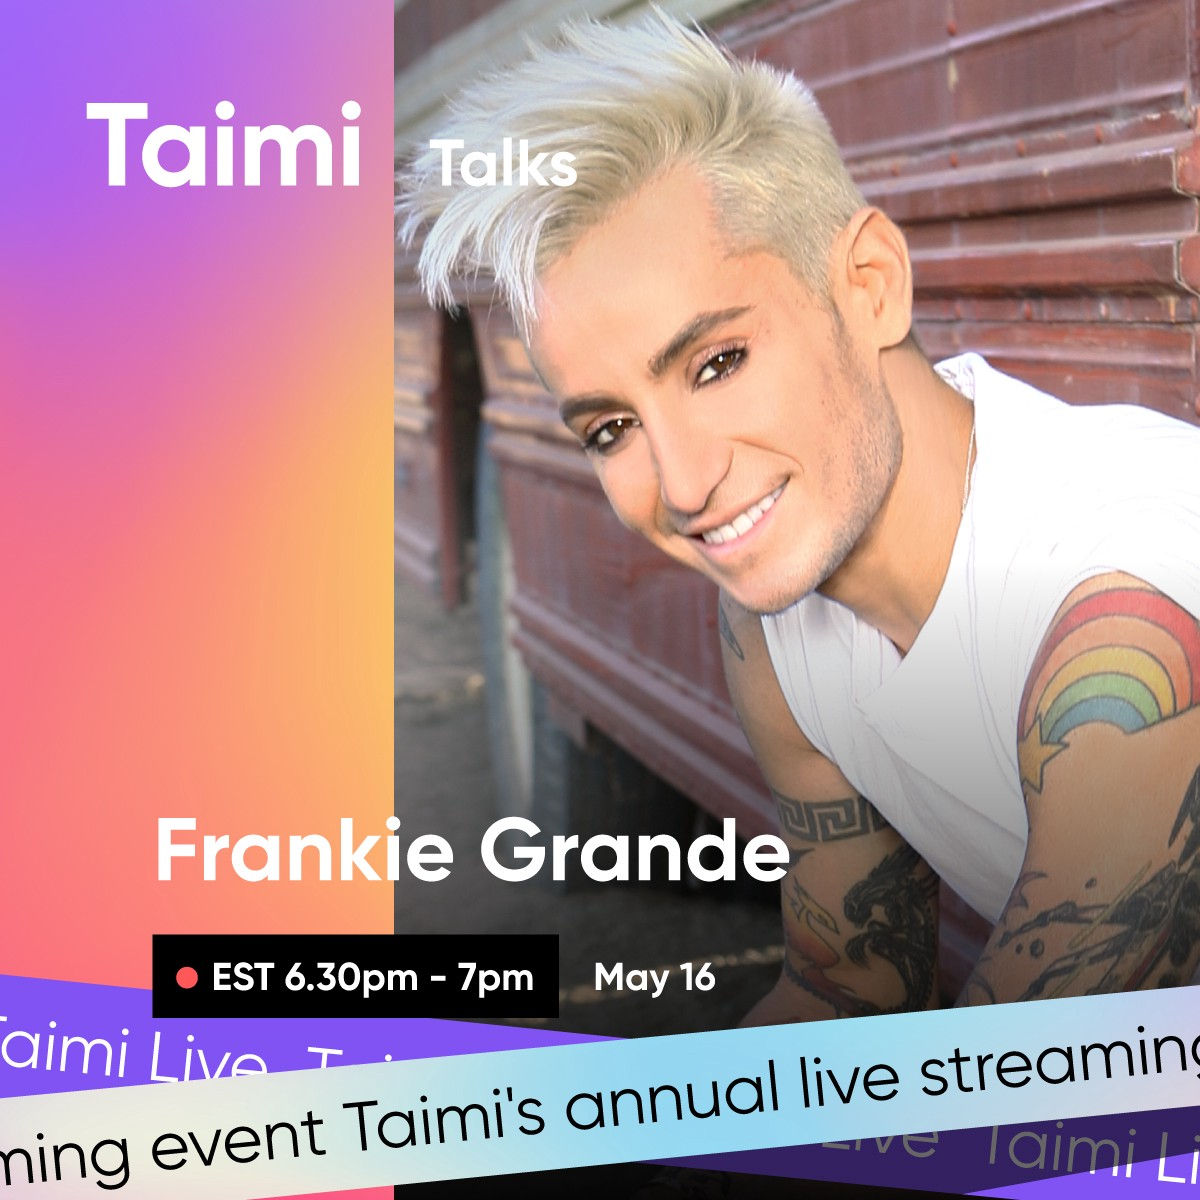 Taimi Talks, featuring Frankie Grande